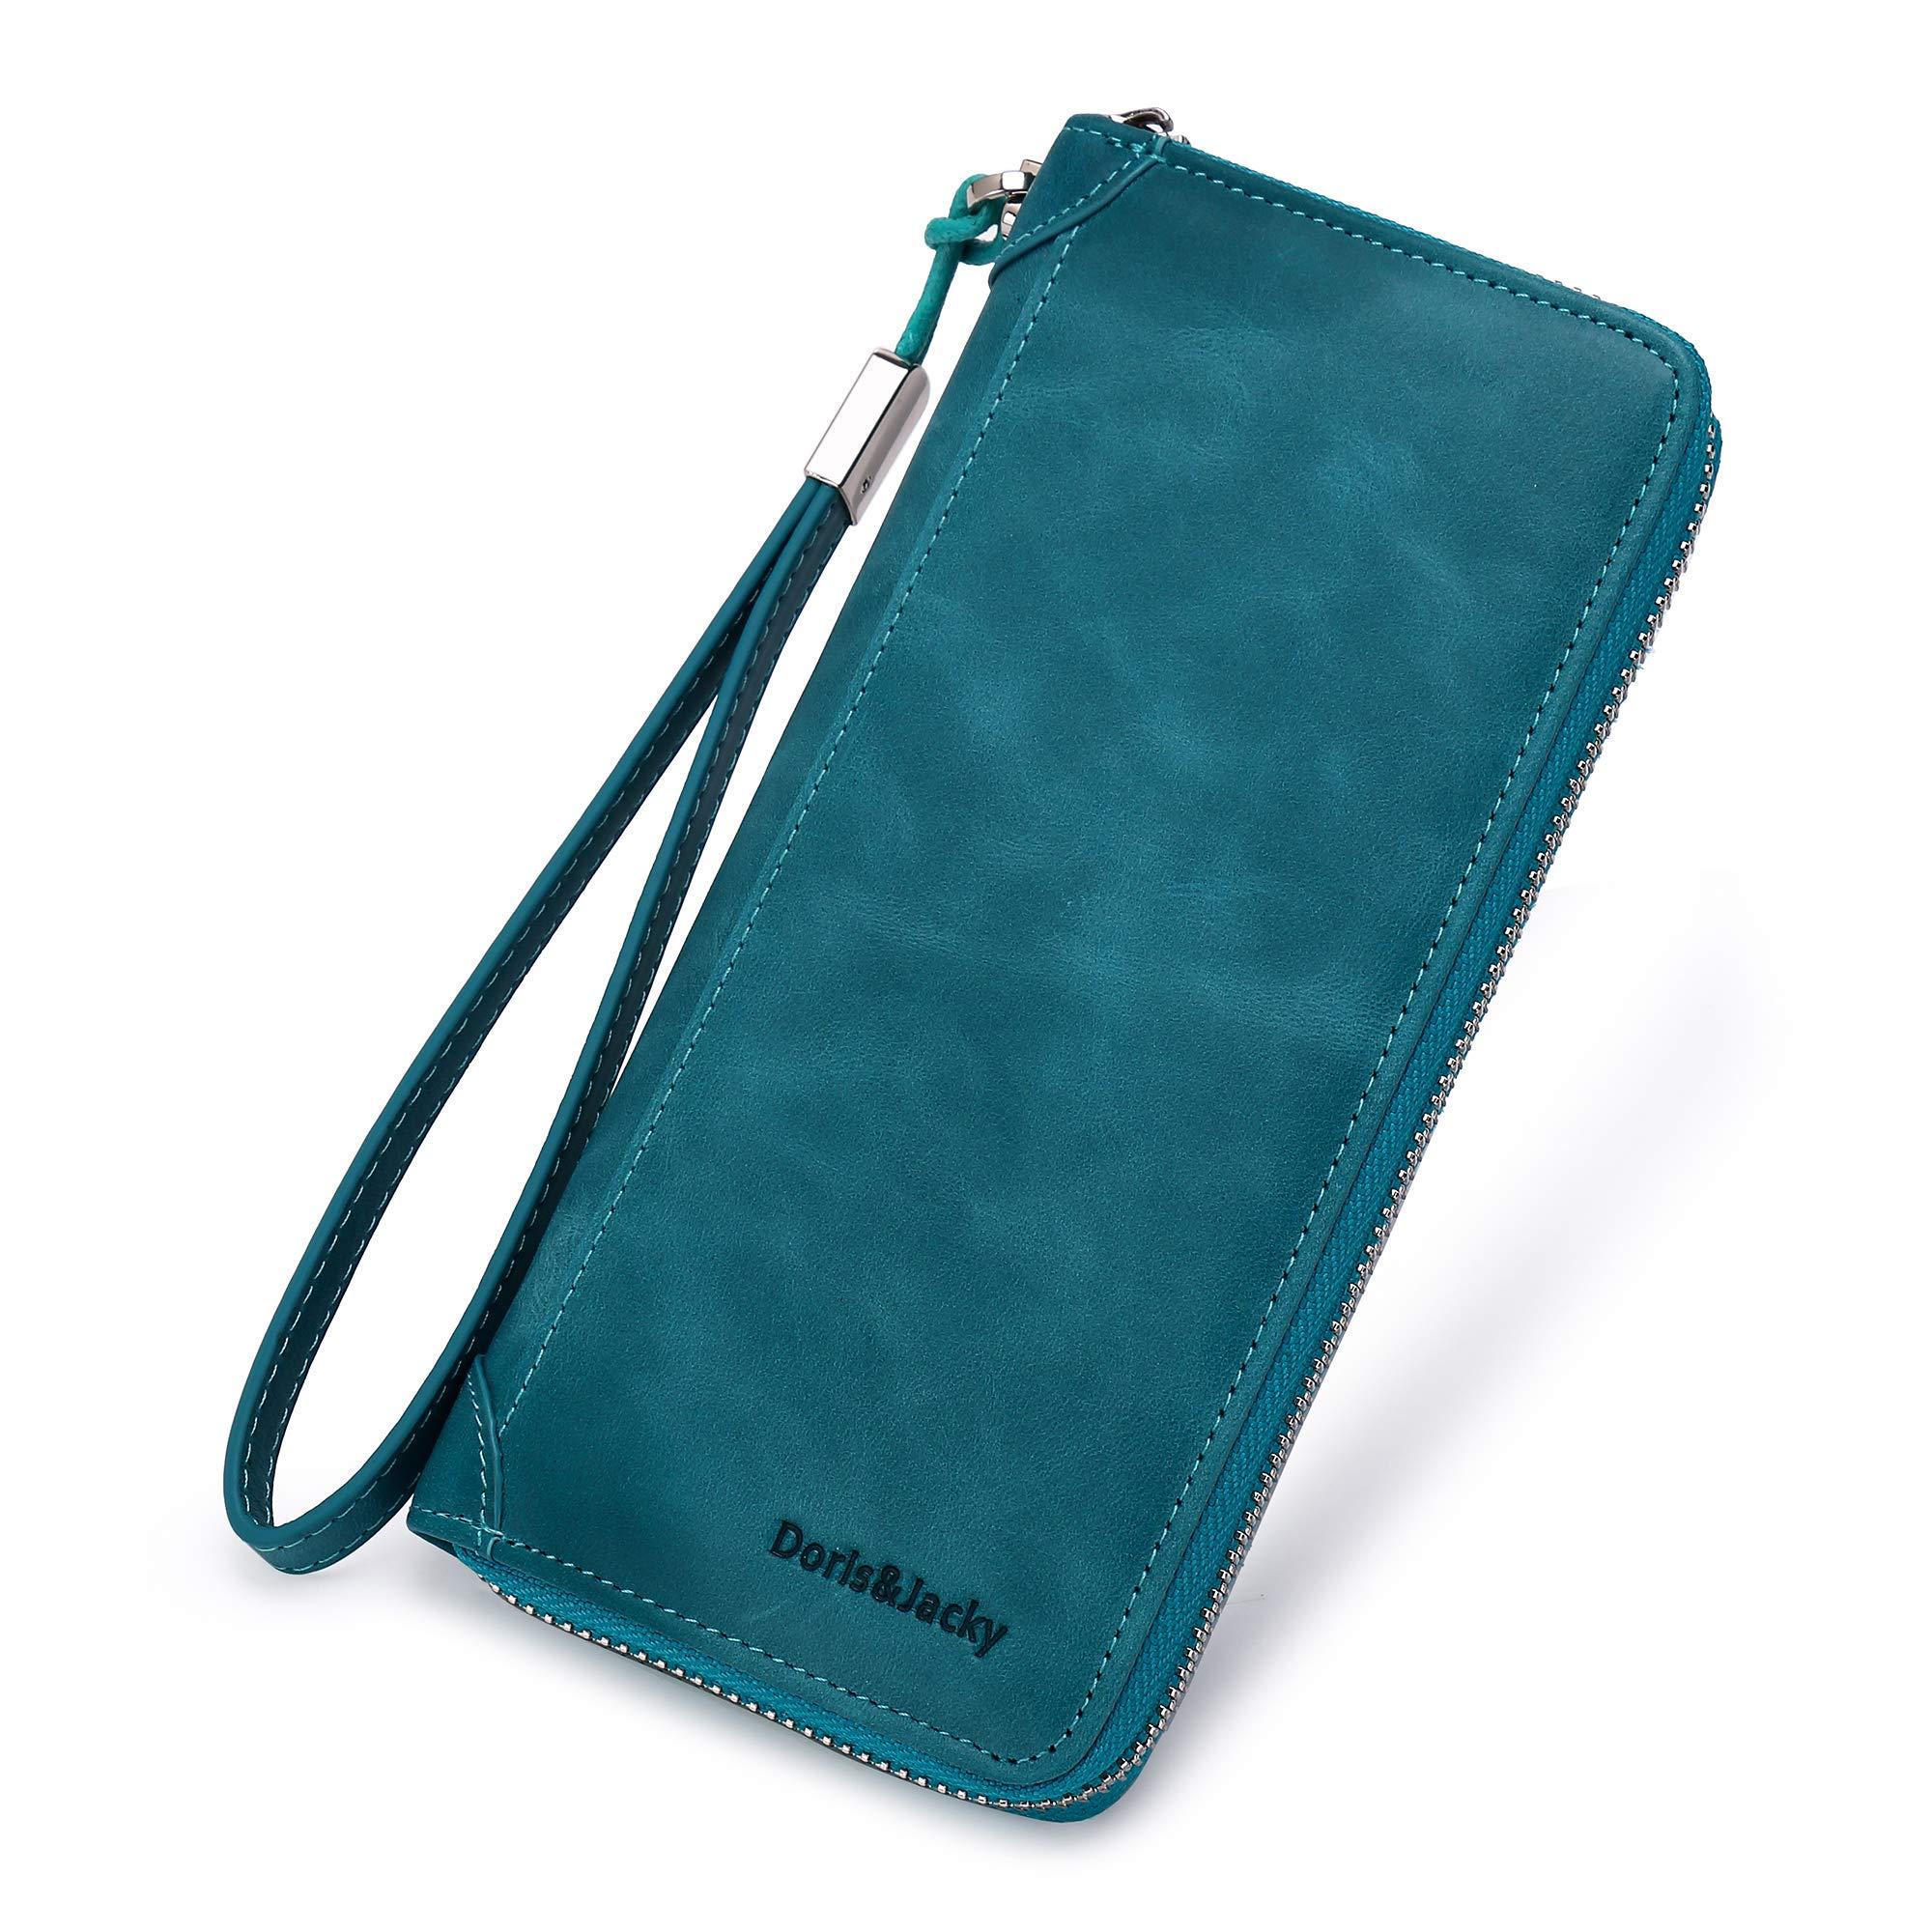 Women Leather Wallet Rfid Blocking Large Capacity Zipper Around Travel Wristlet Bags (Lake Blue) by Doris&Jacky